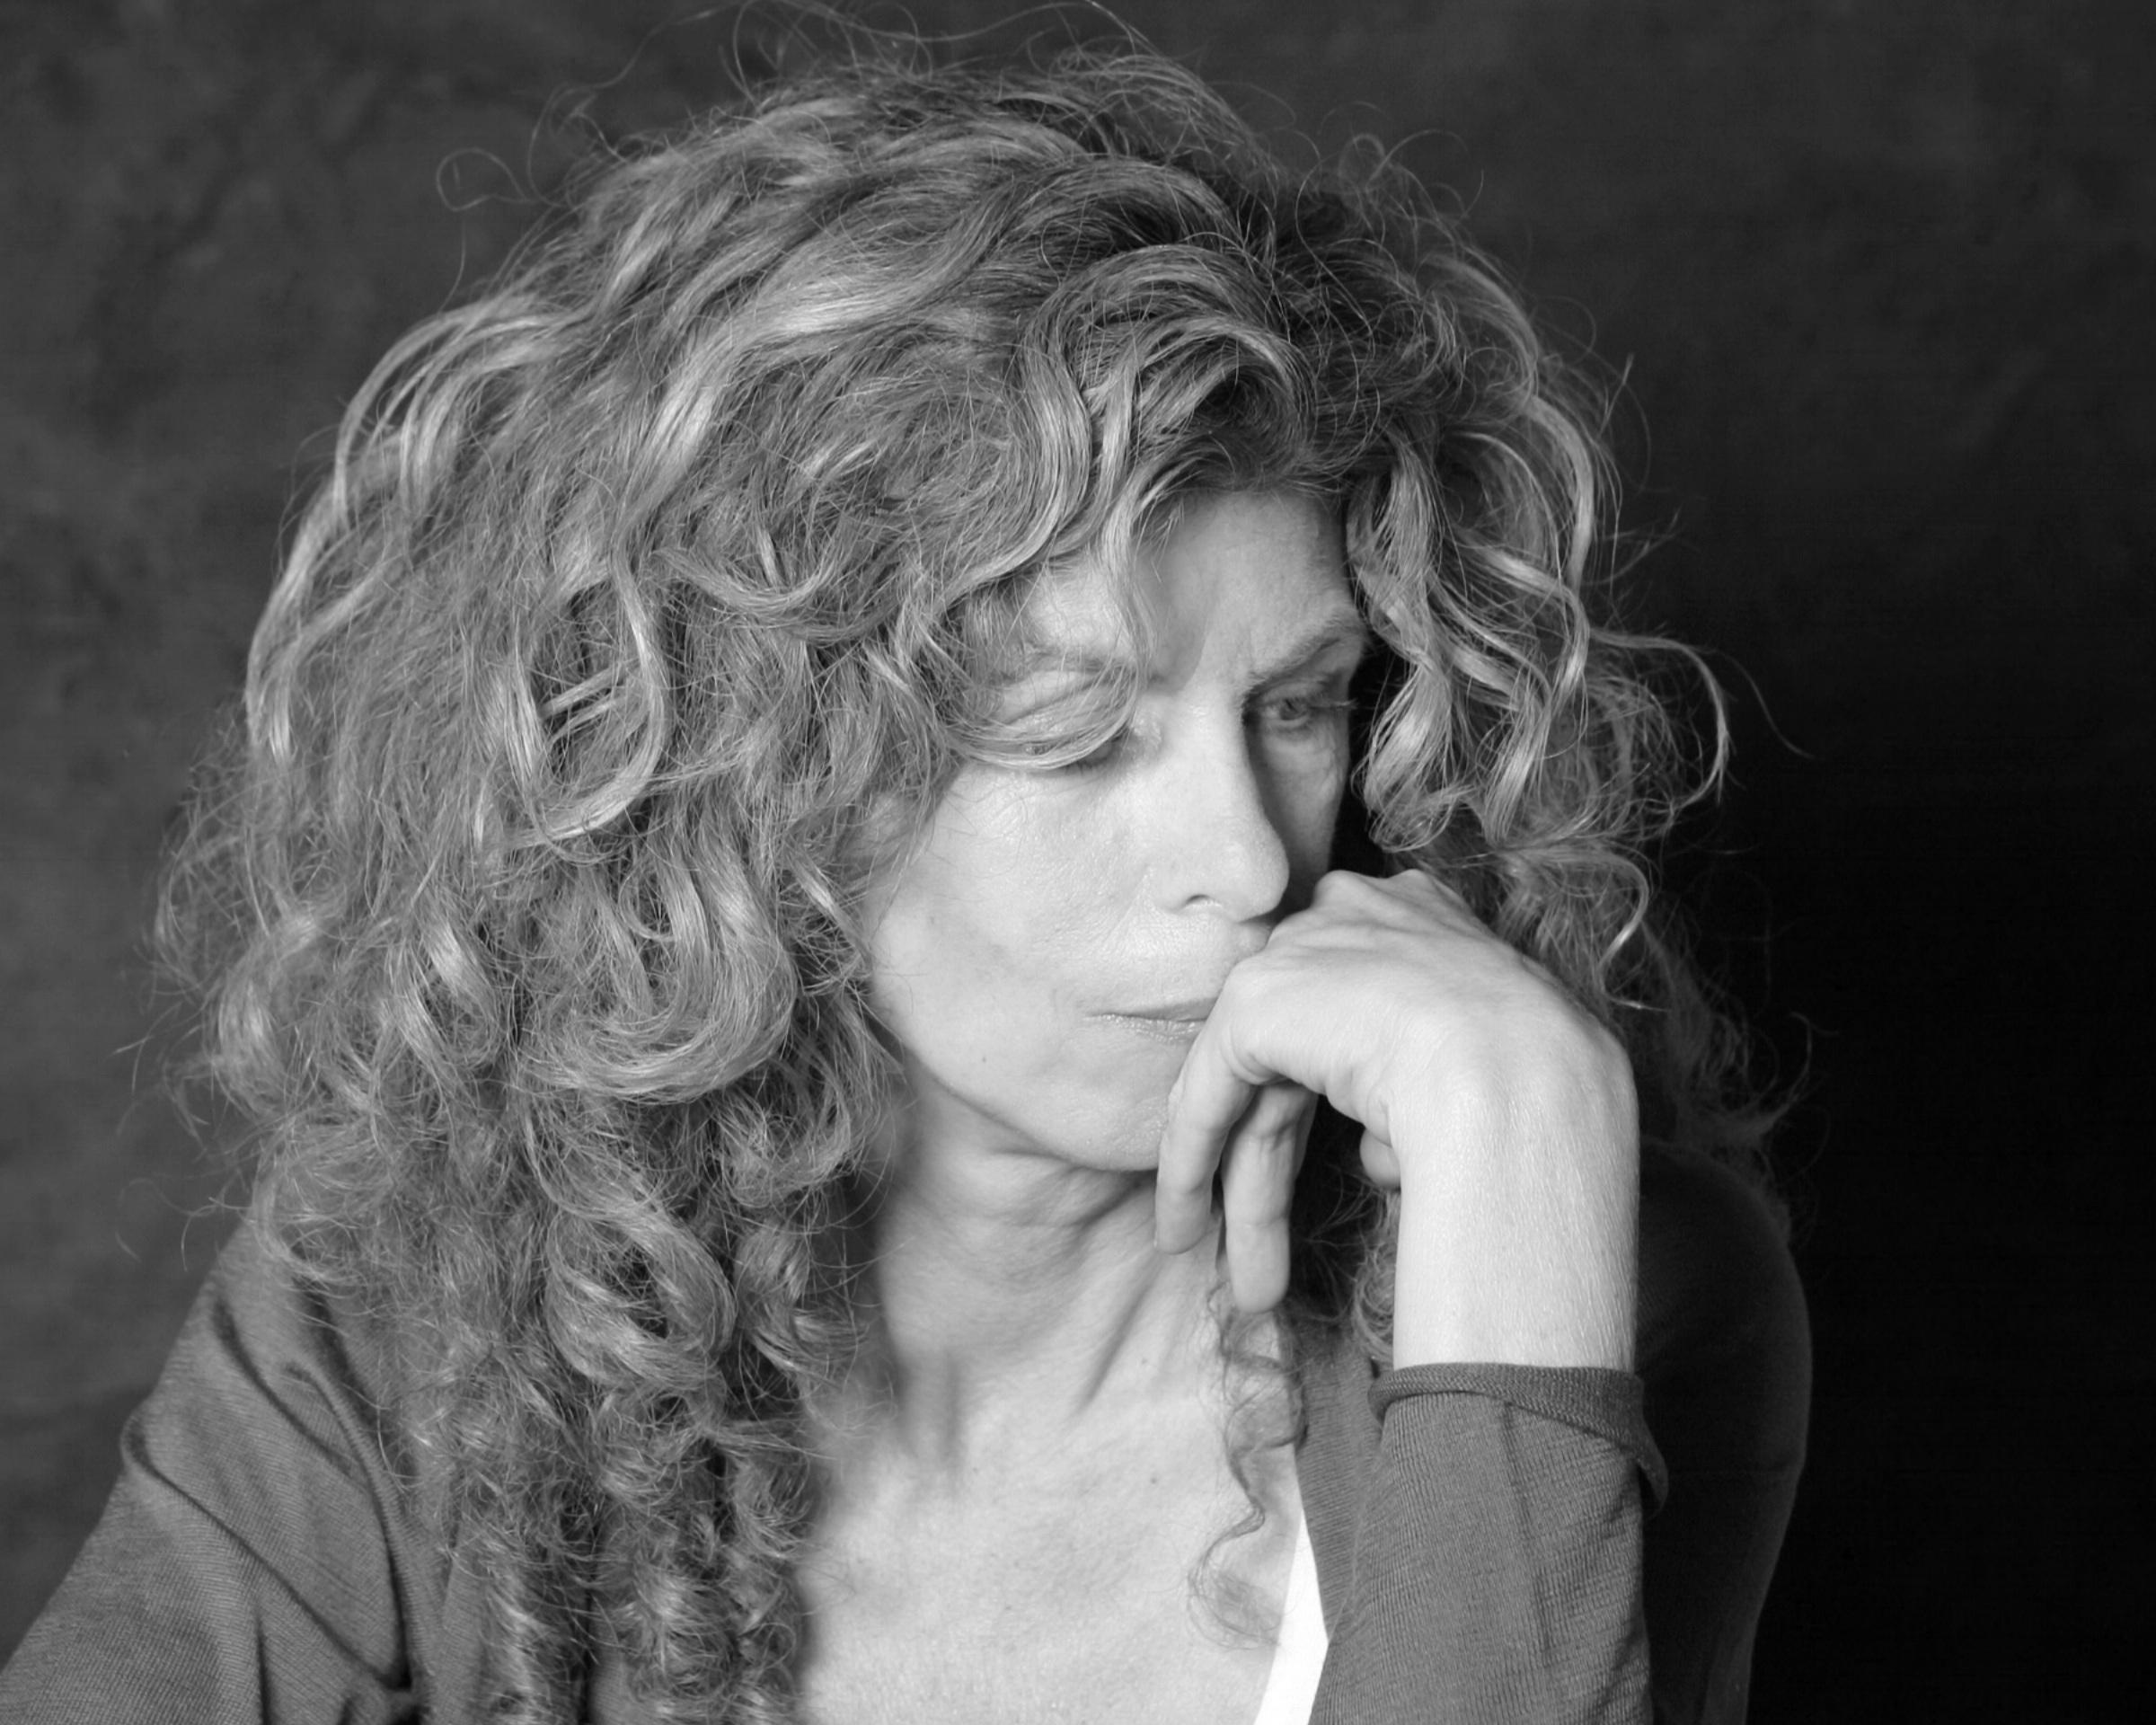 Marie Howe - October 1, 2017